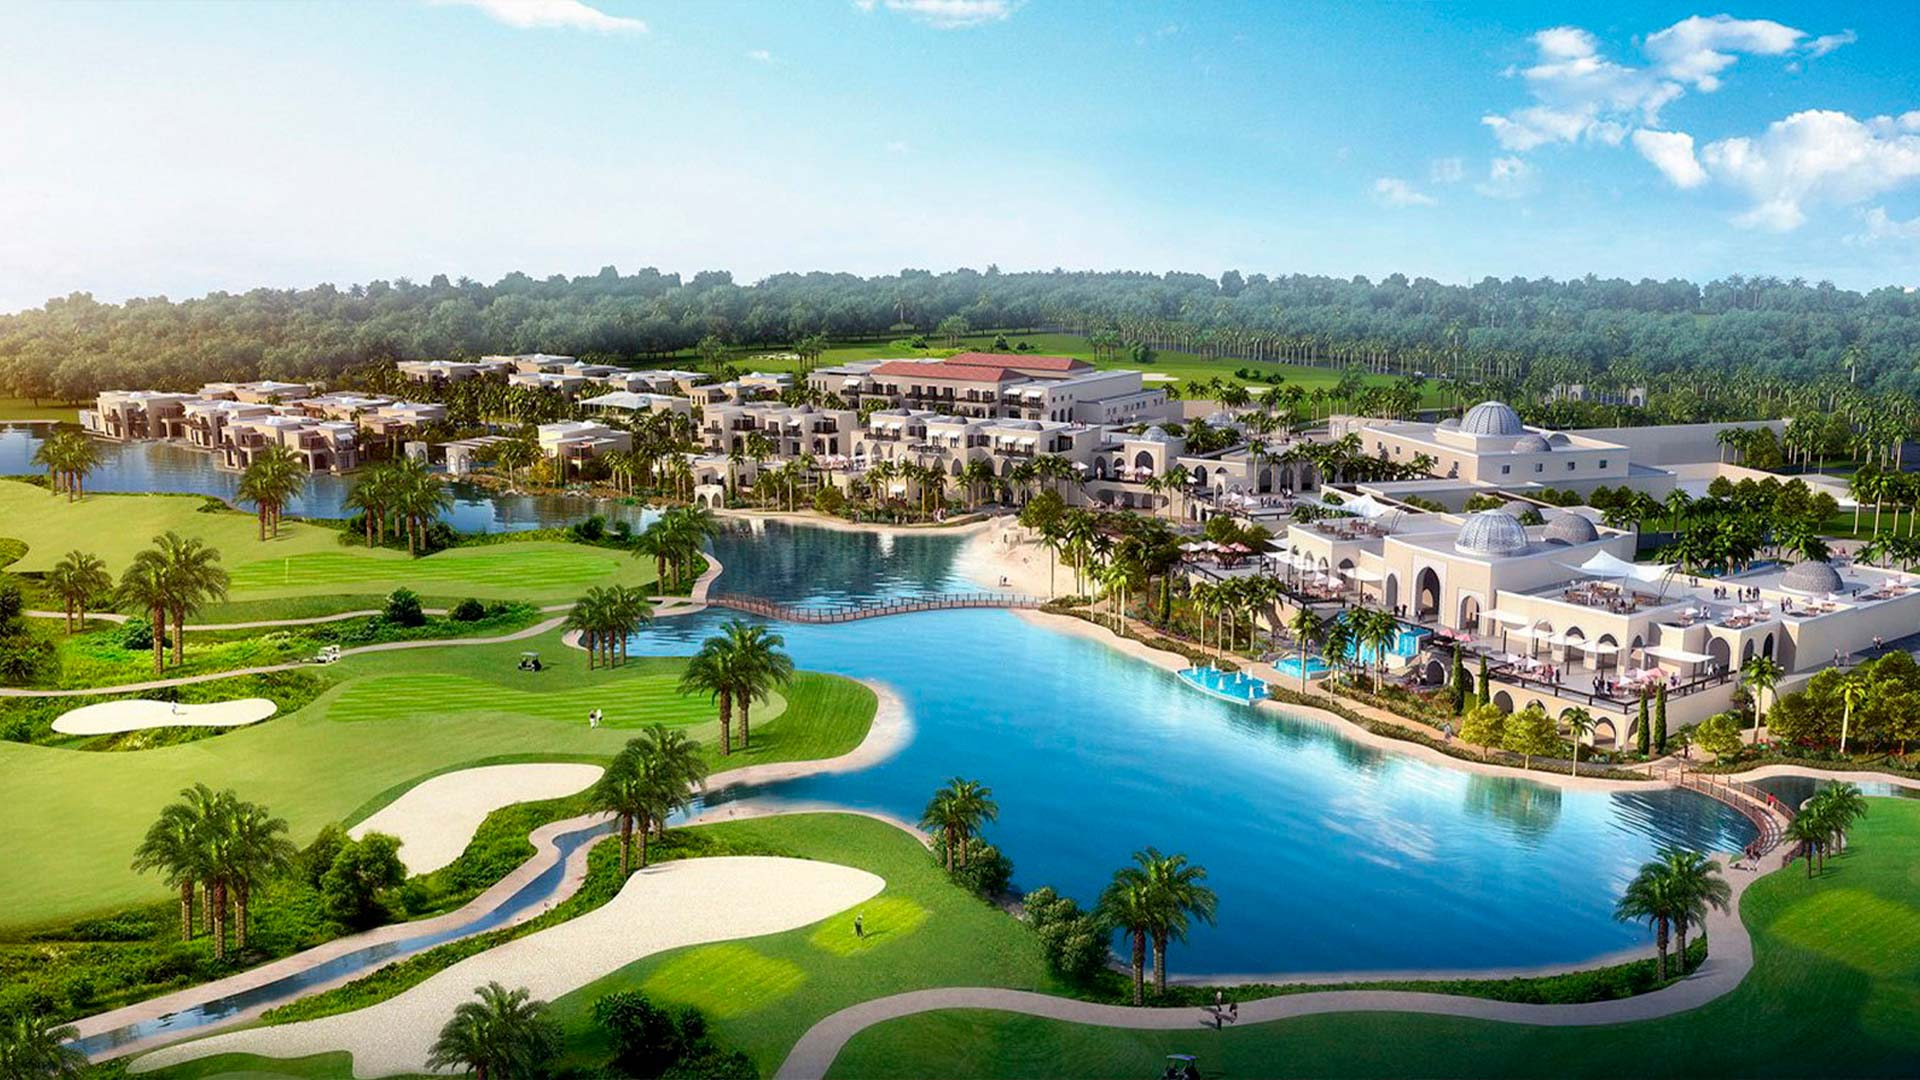 Dubailand - 8